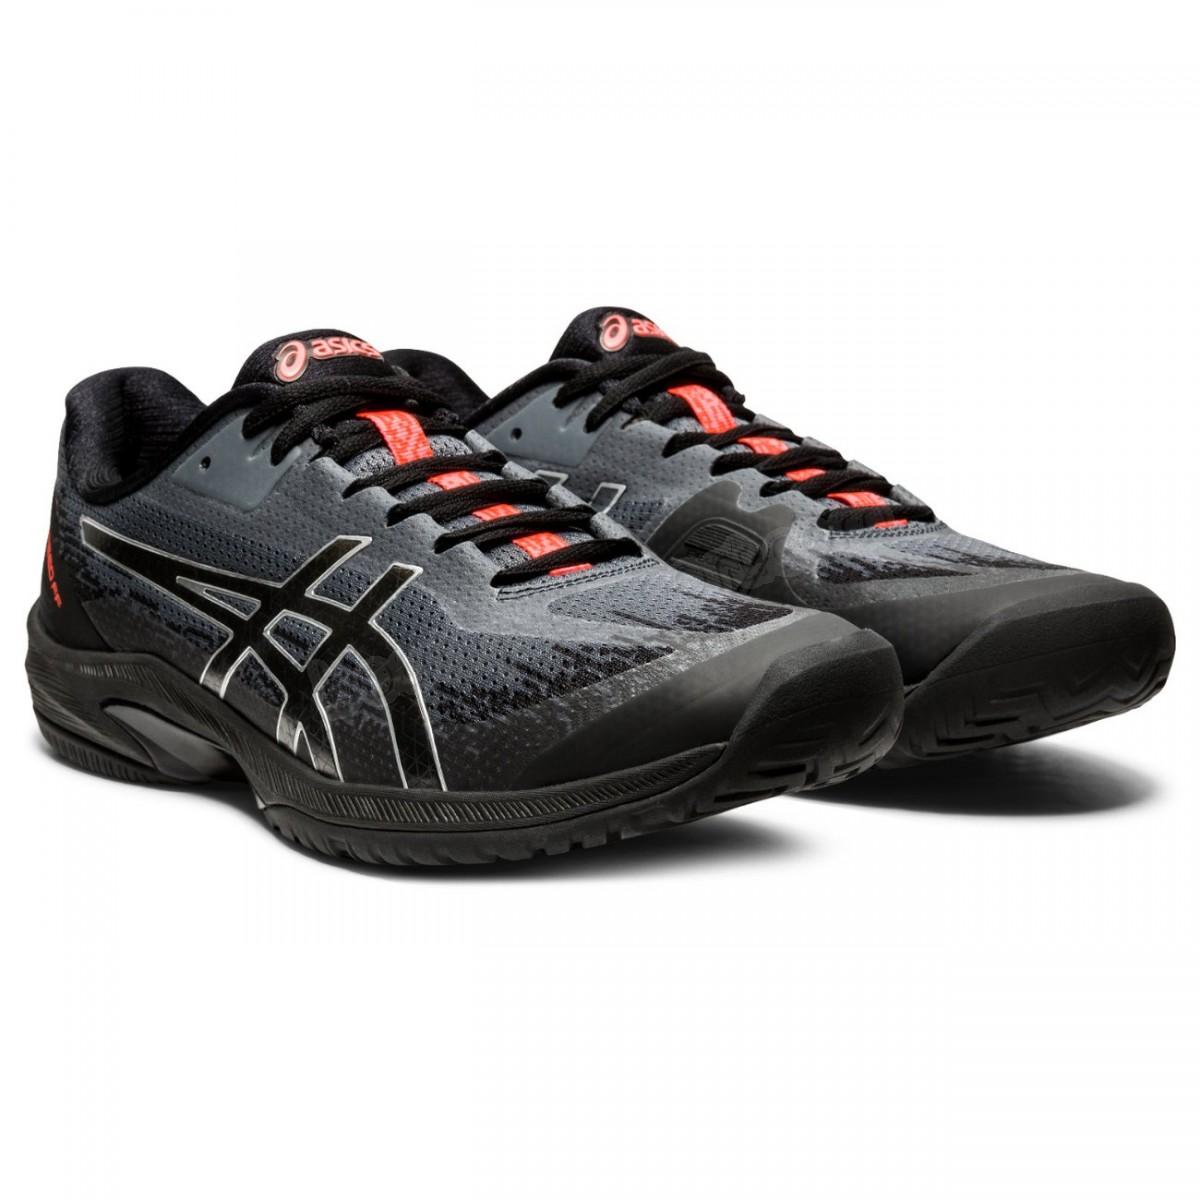 Tennis homme ASICS Chaussures Asics Court Speed Ff L.E Soldes - -31